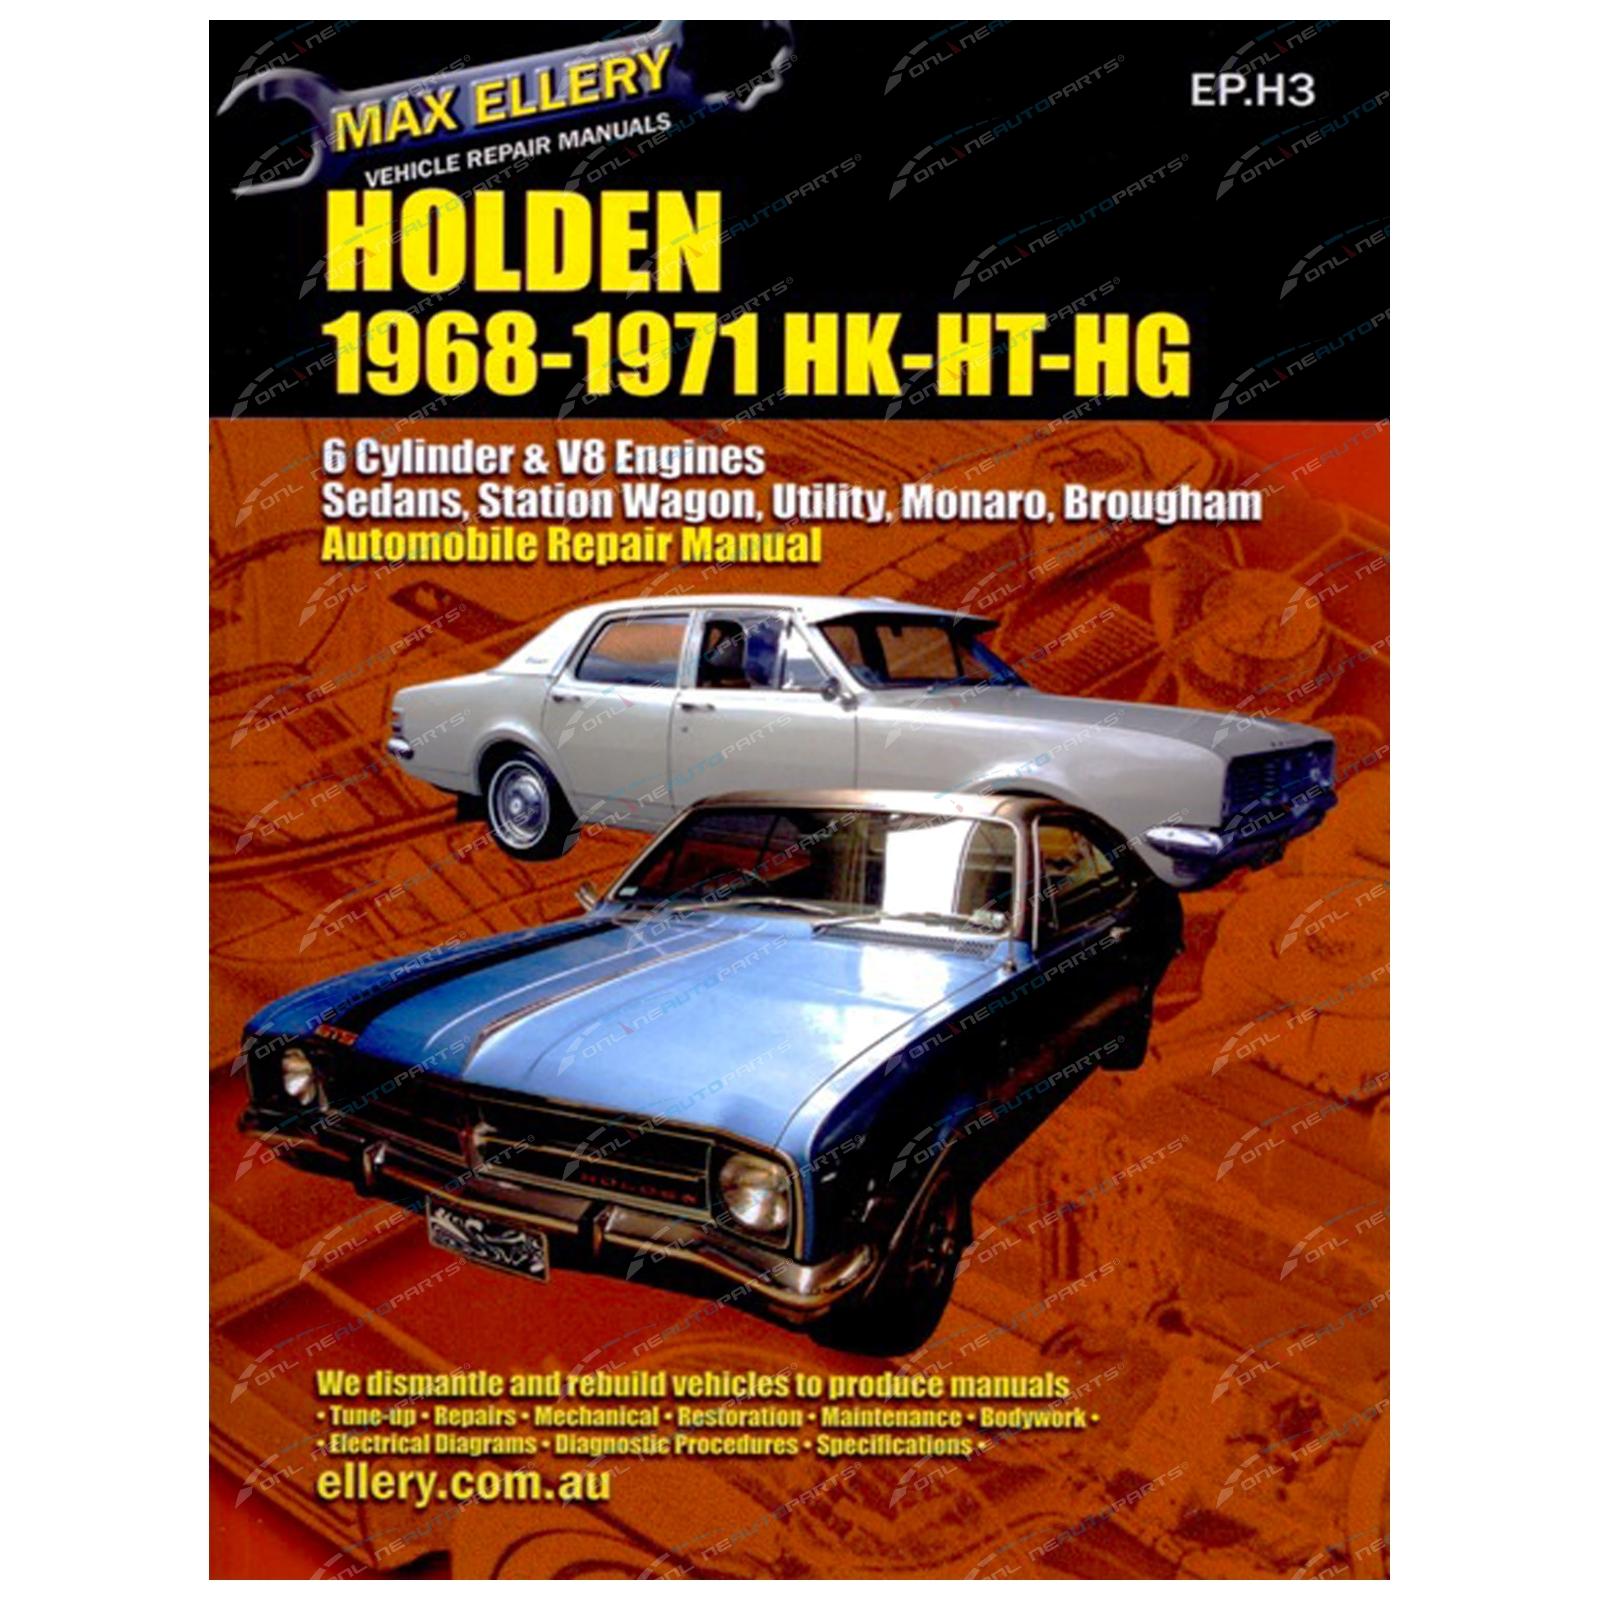 ... Array - workshop car repair manual holden hk ht hg 1968 71 monaro sedan  ute rh